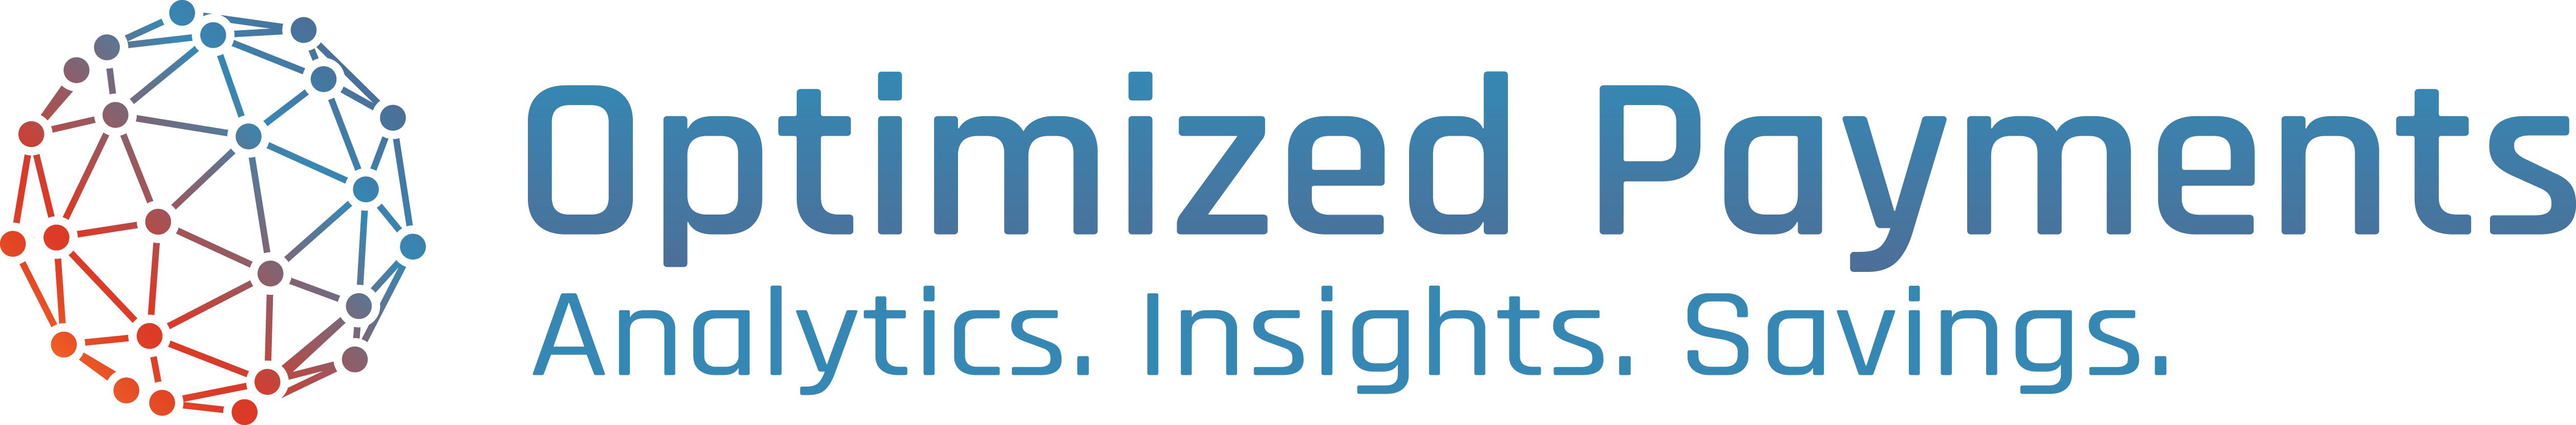 Optimized Payments, Inc.